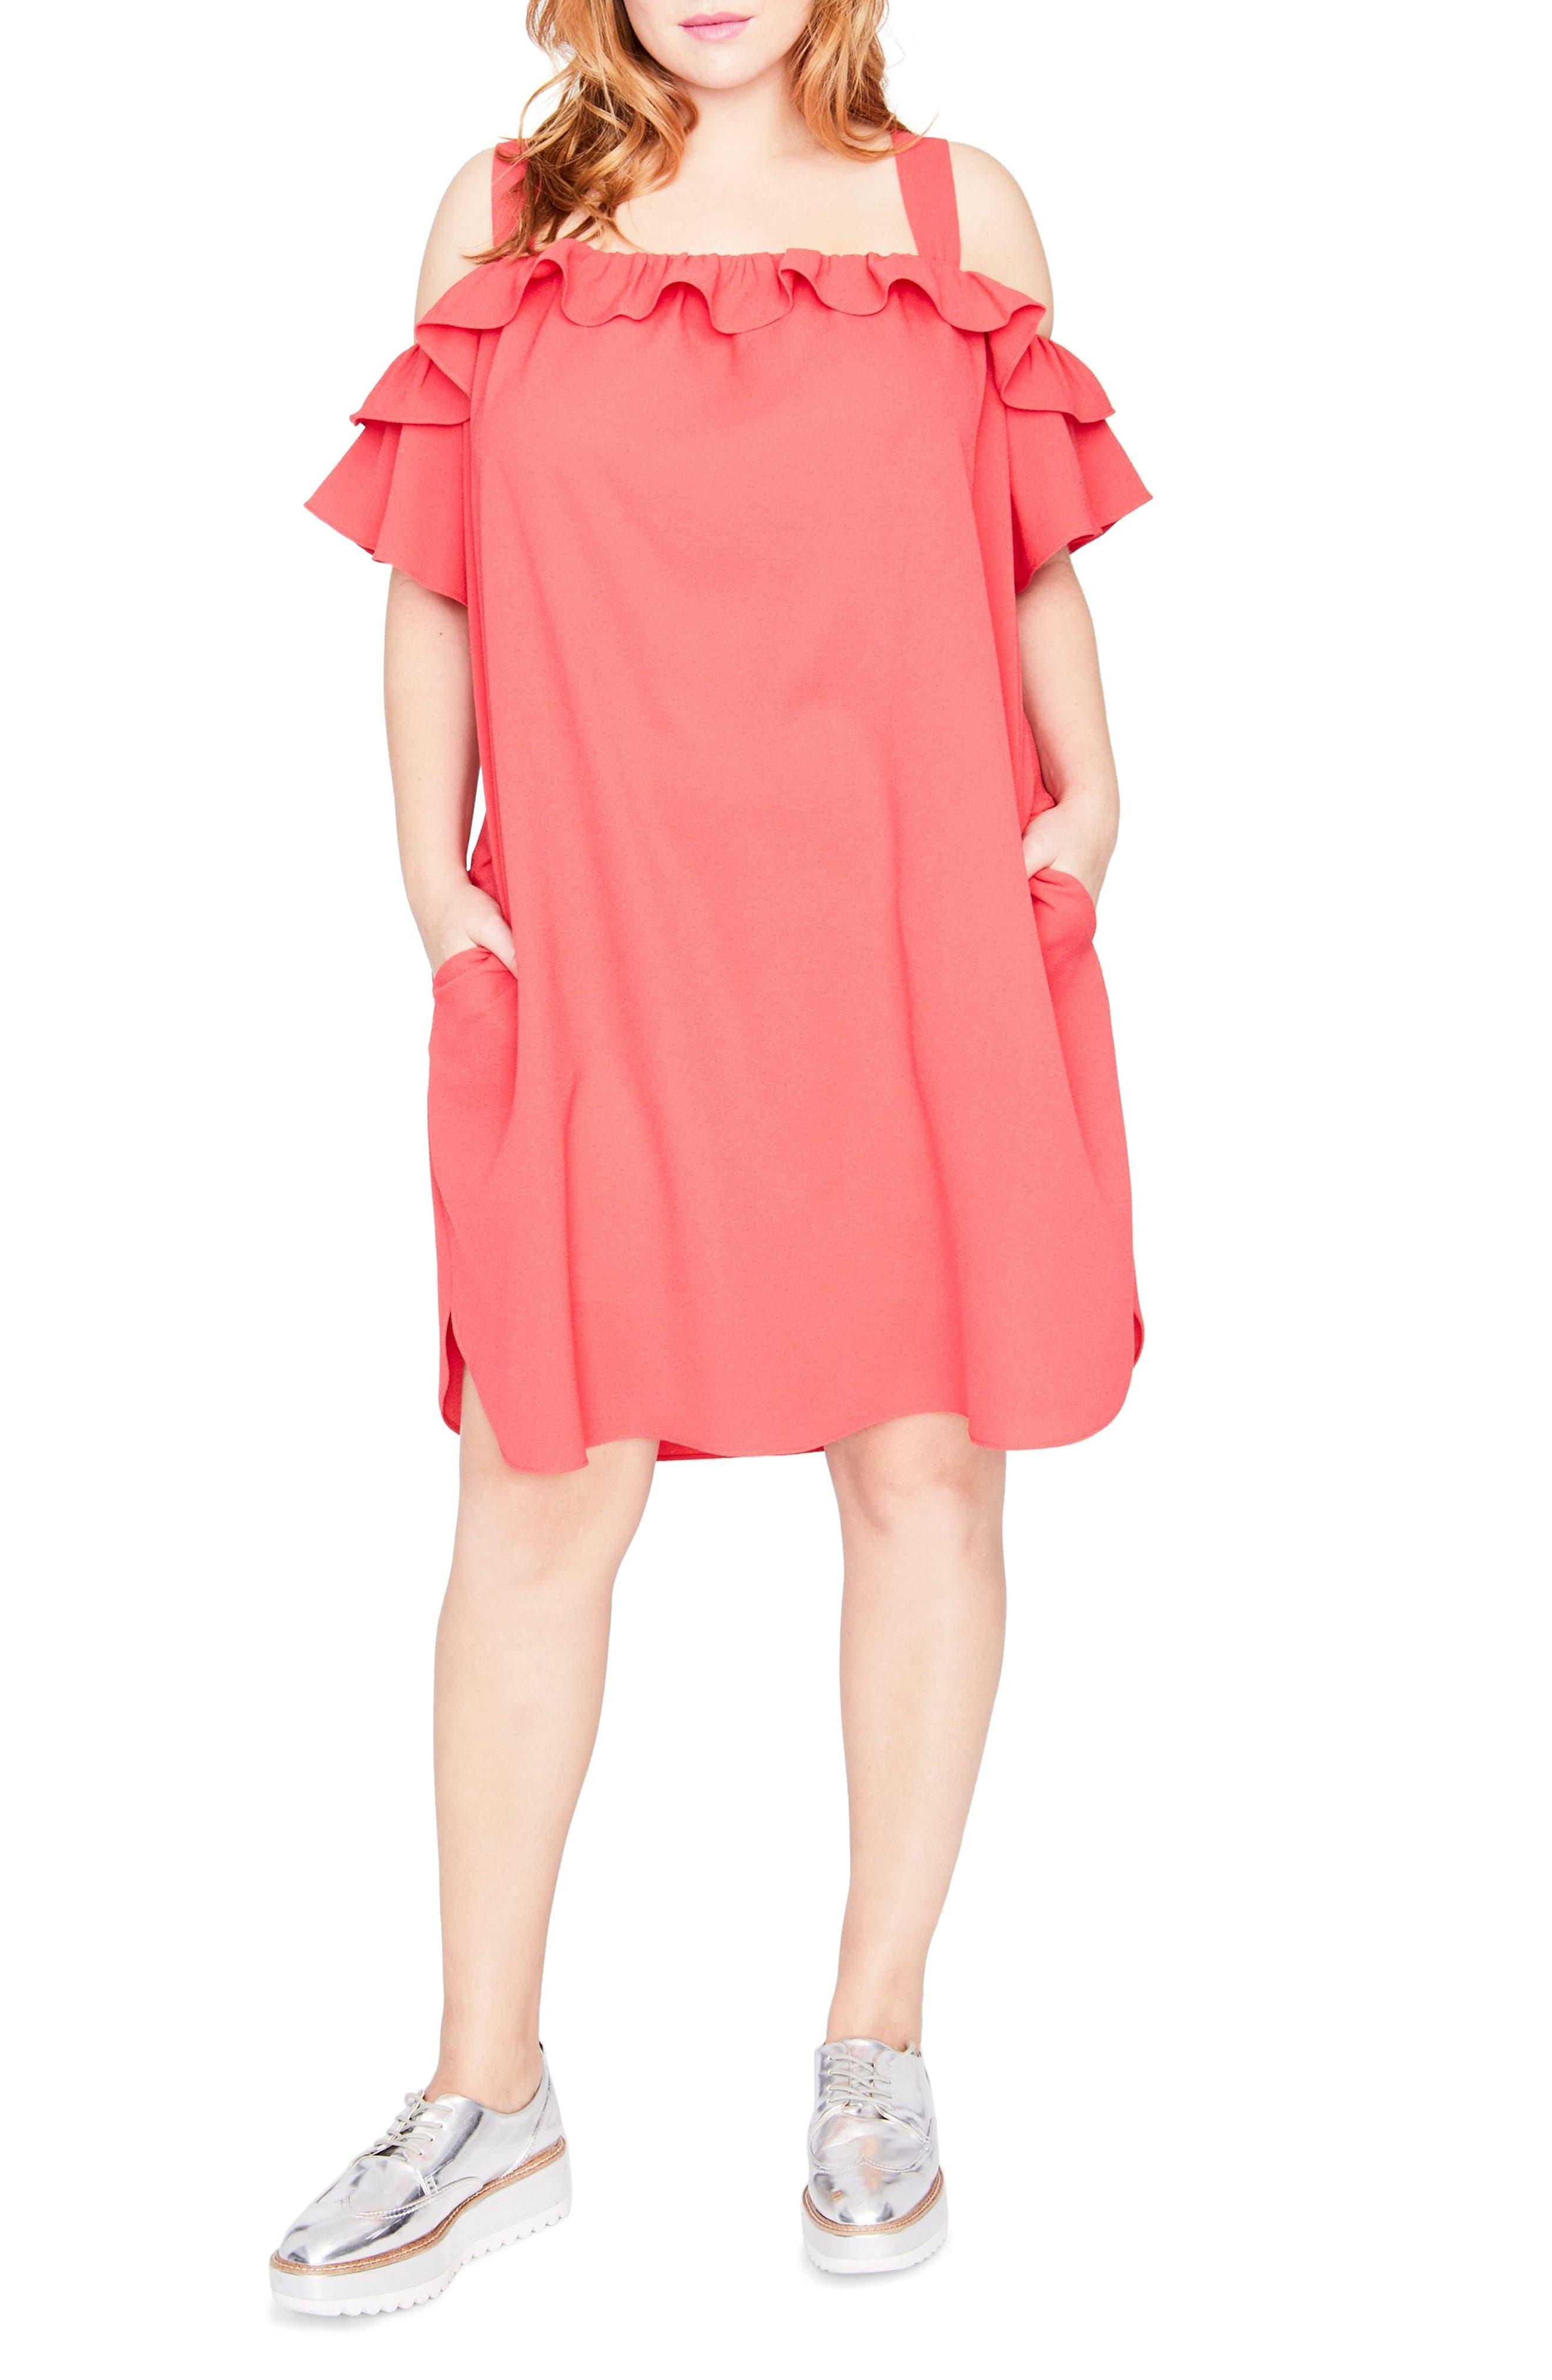 Ruffle Edge Dress,                             Main thumbnail 1, color,                             648